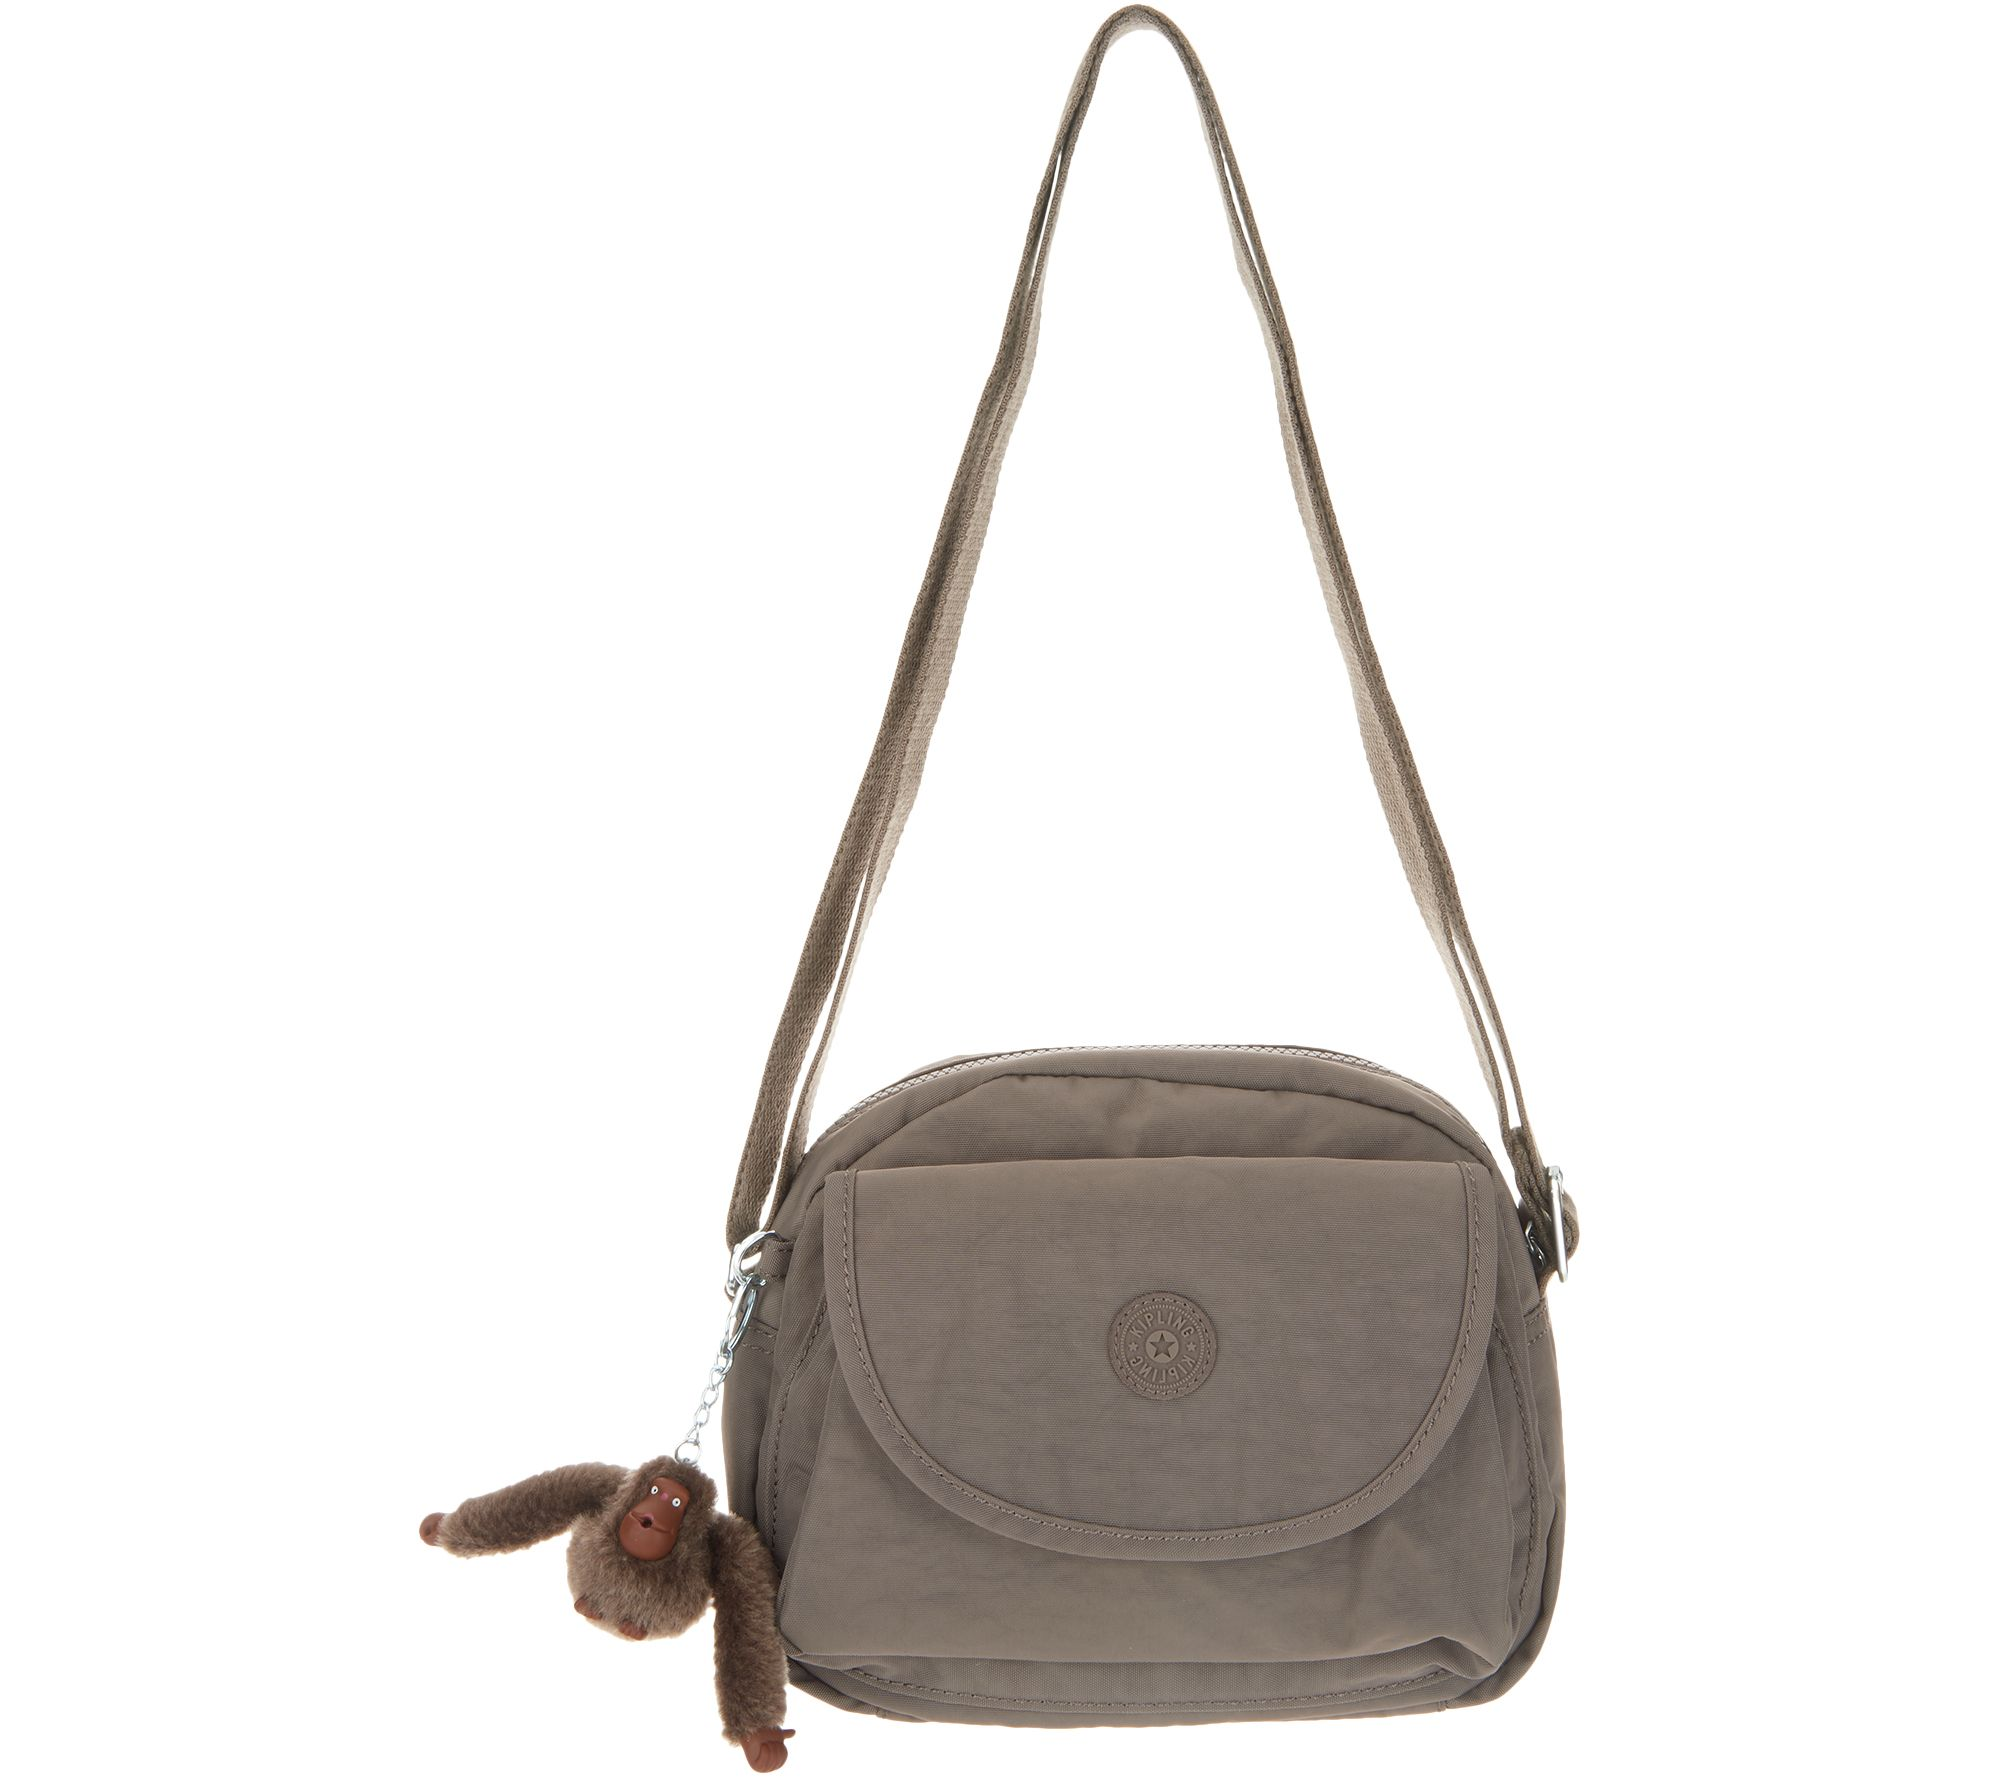 98702253299 Kipling Small Adjustable Crossbody Bag - Stelma - Page 1 — QVC.com